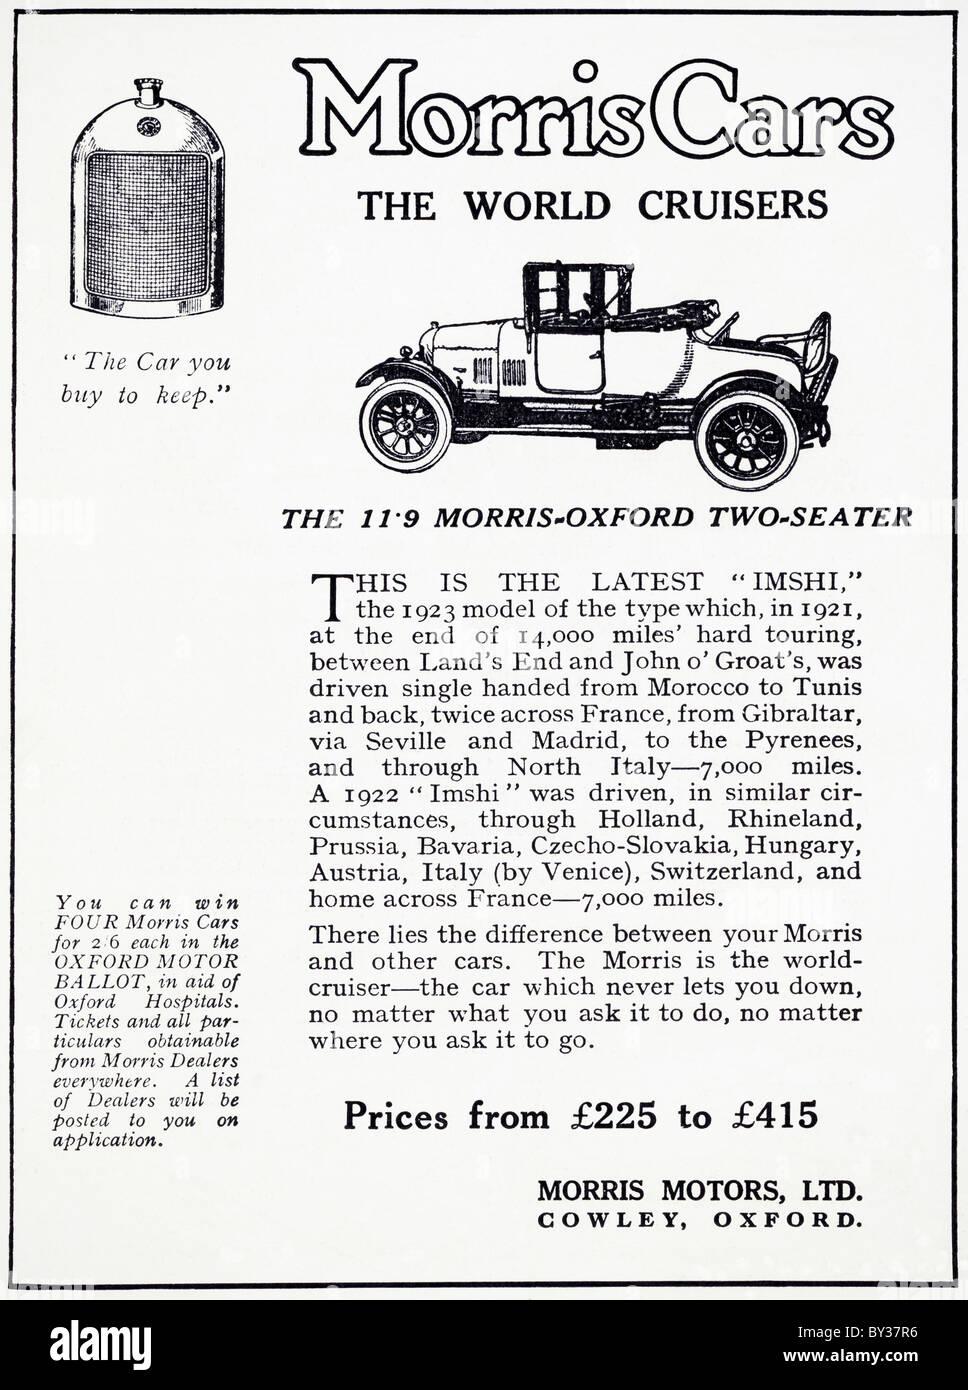 Bullnose Morris Vintage Car Stock Photos & Bullnose Morris Vintage ...